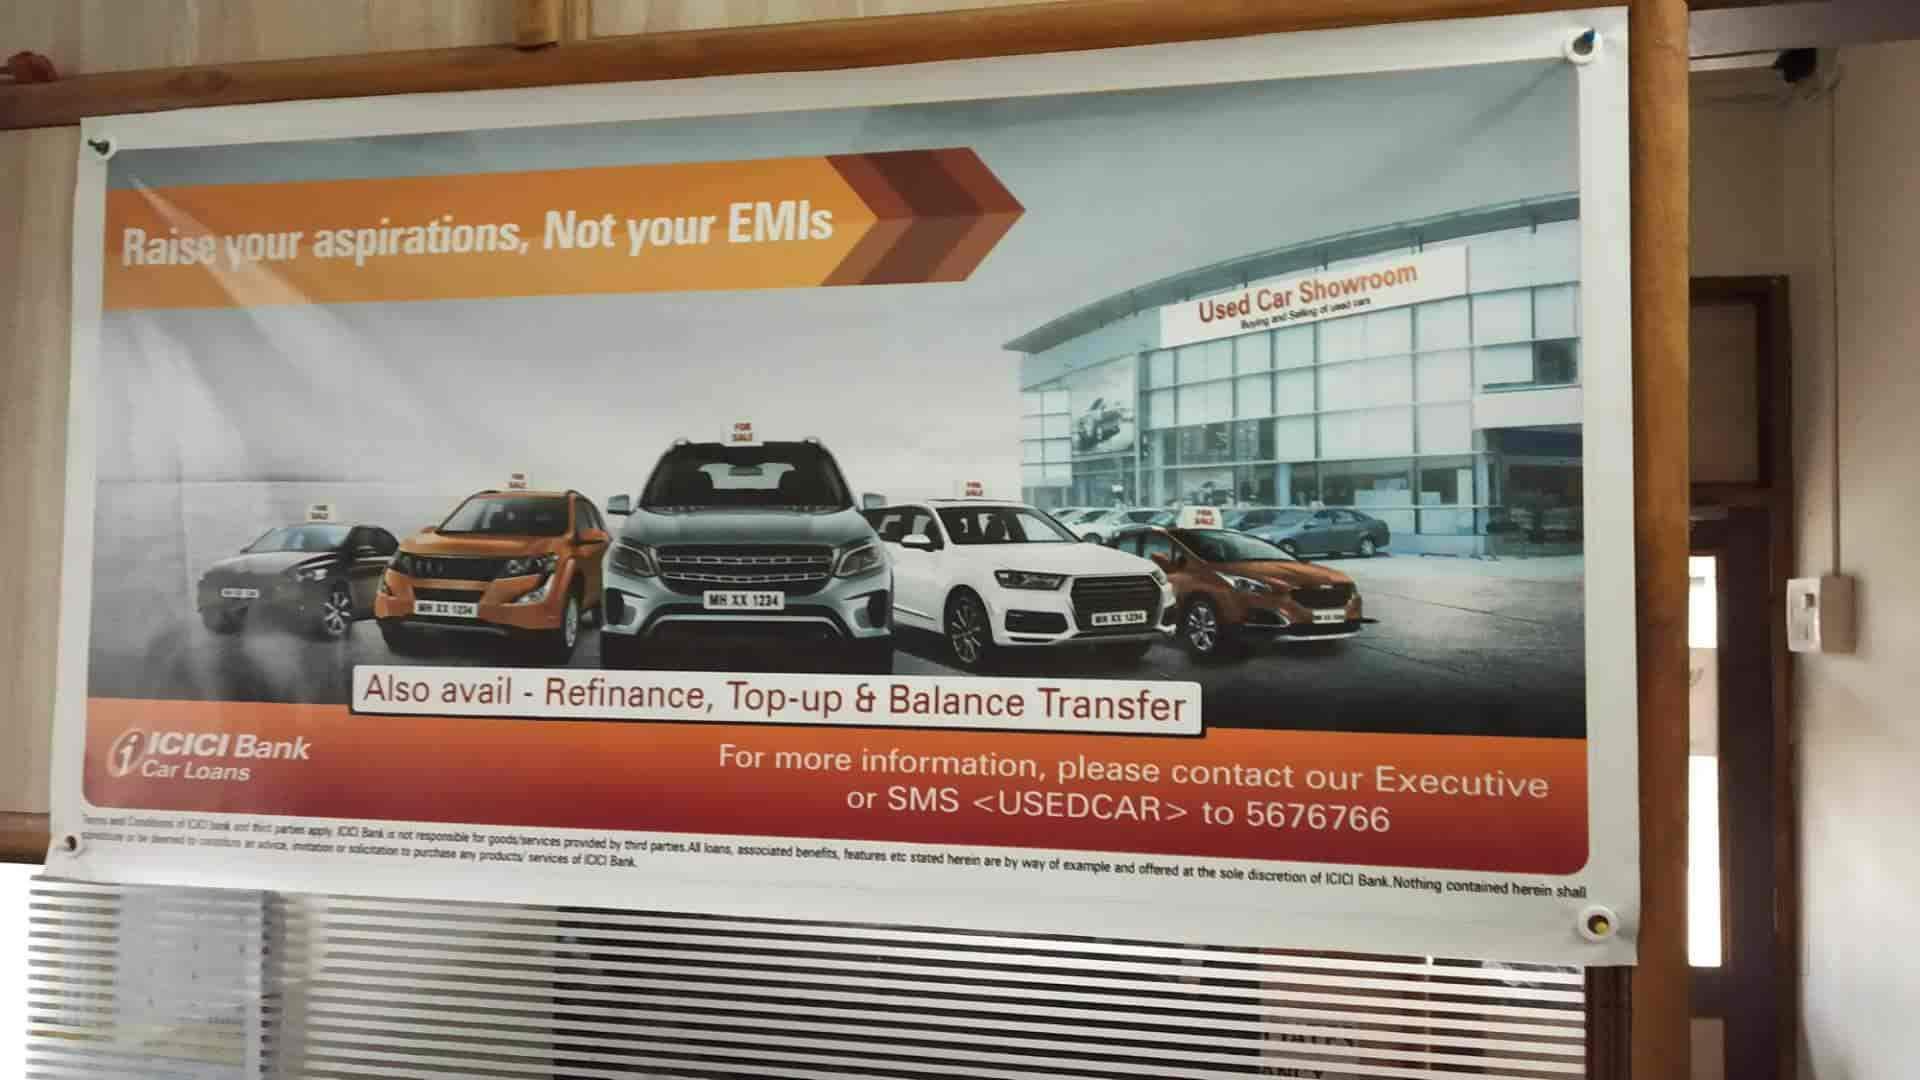 poimittu paras verkkosivusto saapuvat Lotus Vision Financial Solutions, Hupari - Car Loans in ...